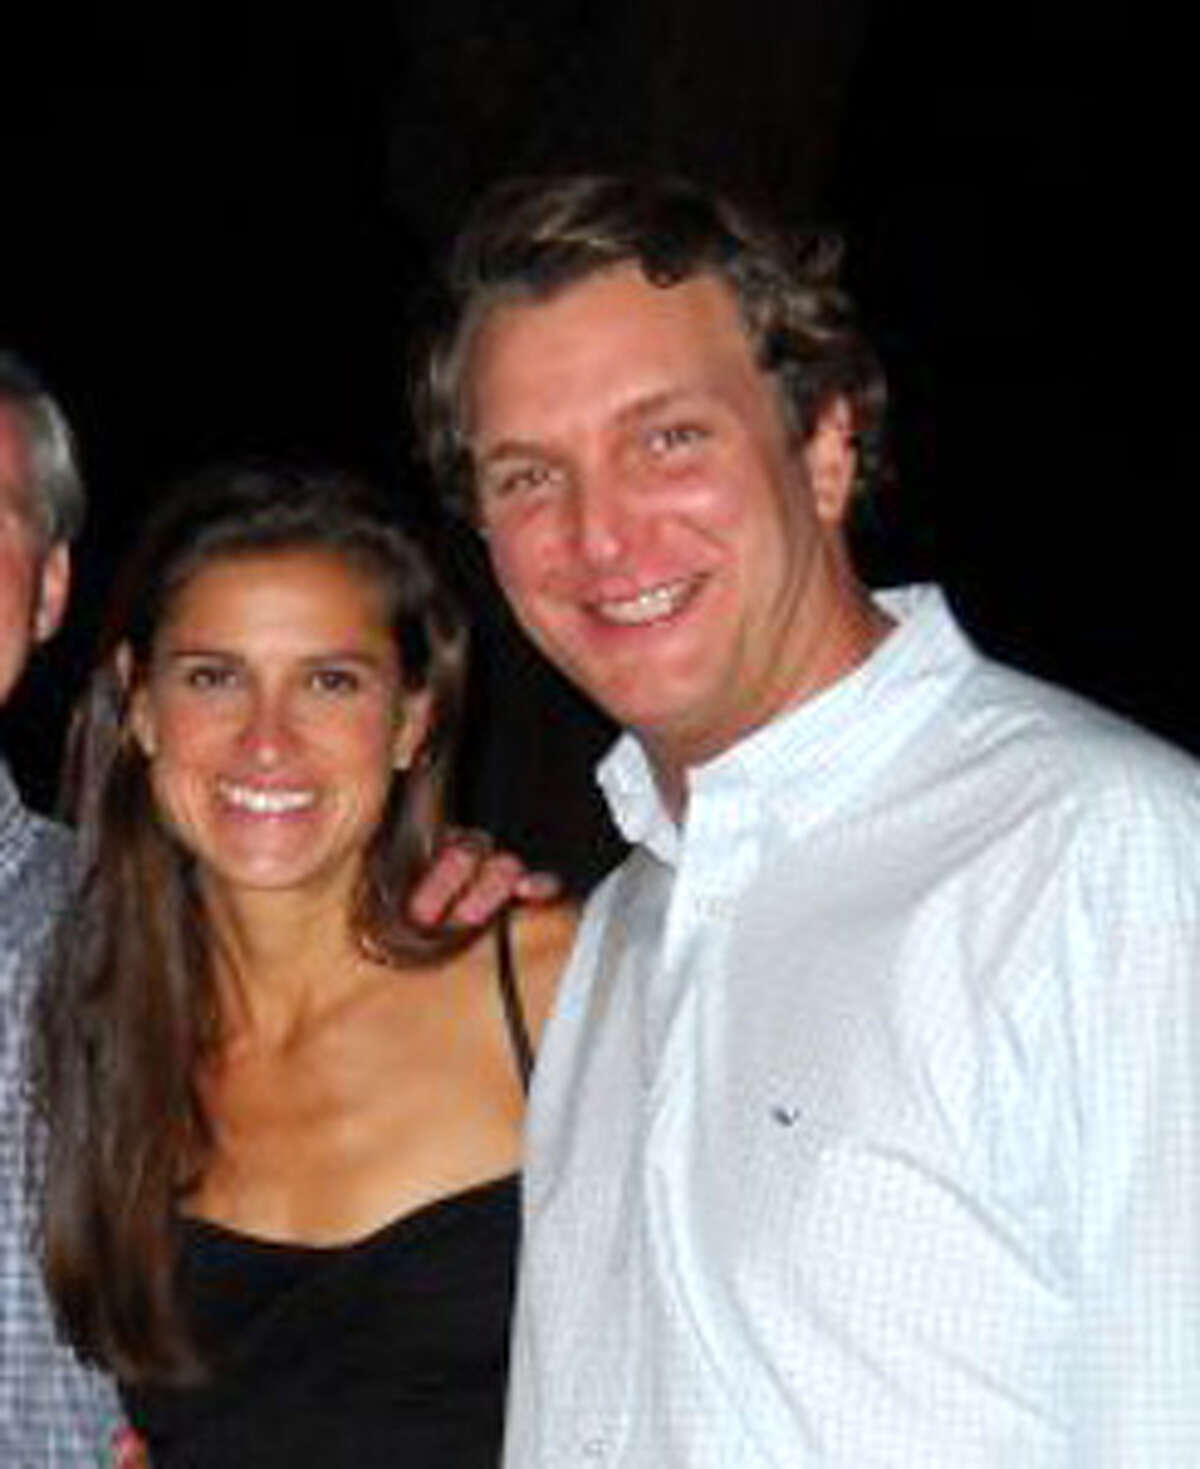 Jennifer Lasher Tinsmon and Daniel J. Despart. (From Despart's Facebook page)